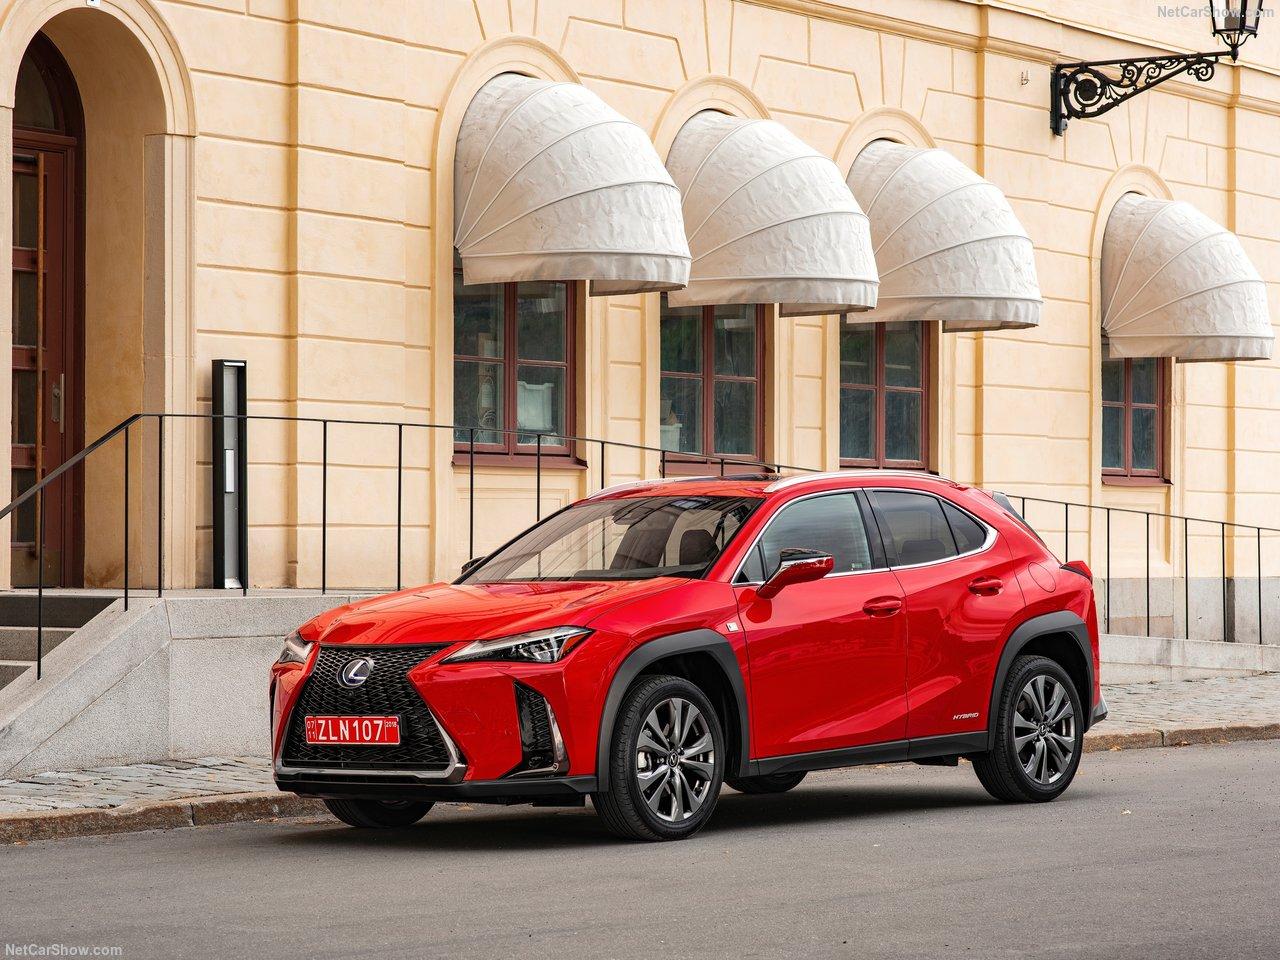 Lexus-UX-2019-1280-06_201808291334522dc.jpg